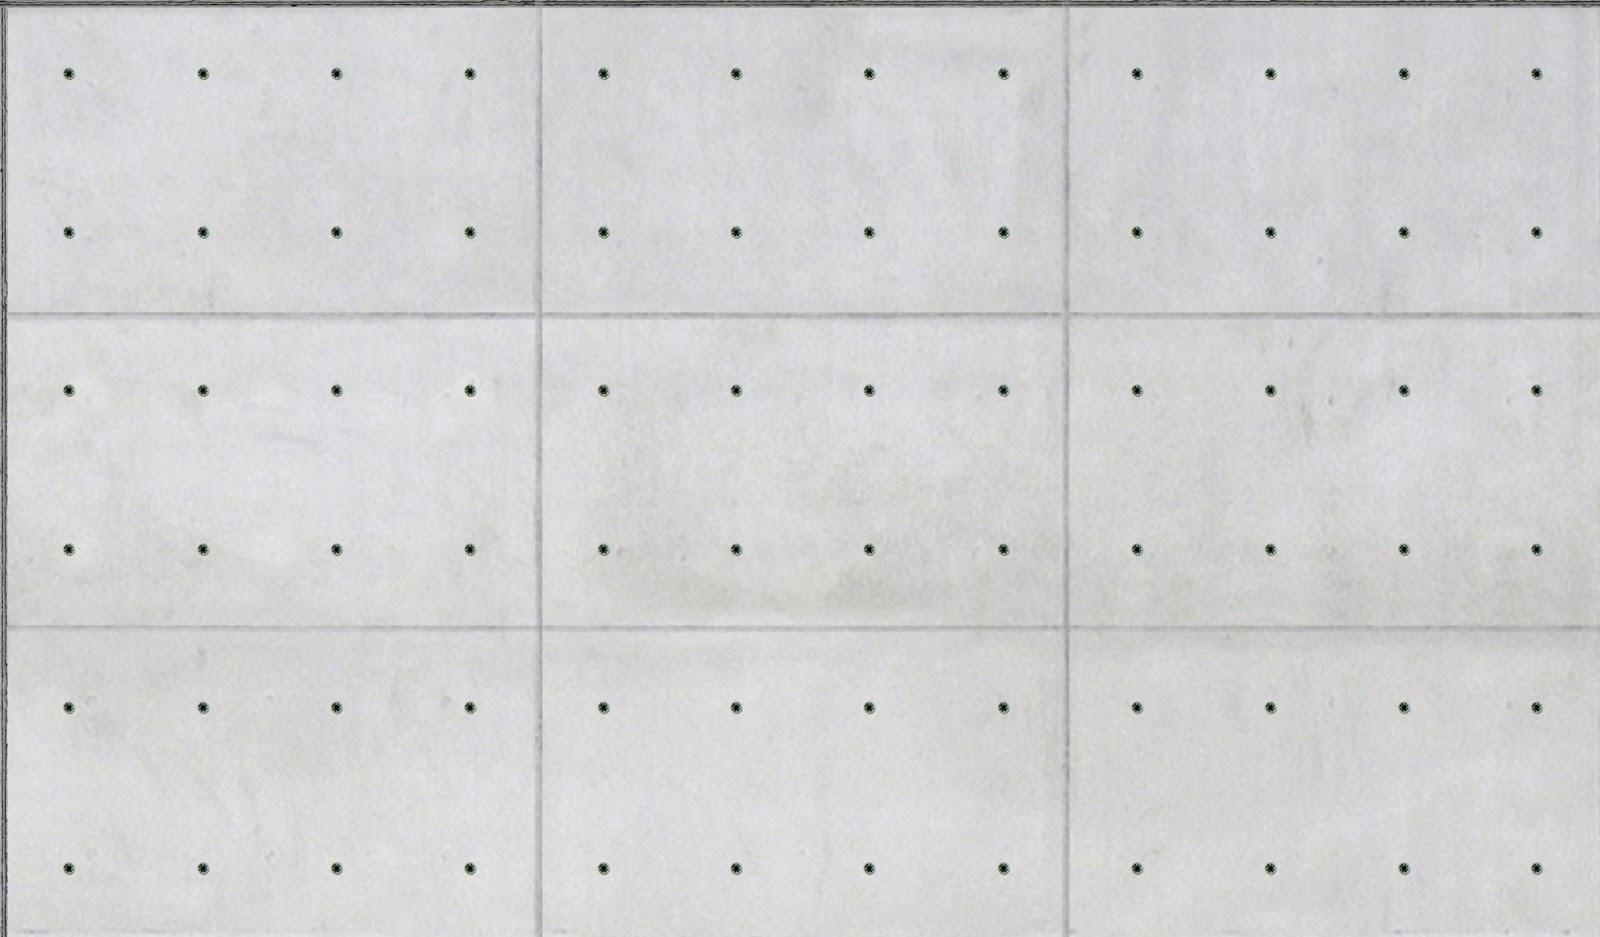 Sketchup Texture Texture Concrete Concrete Tiles Stucco